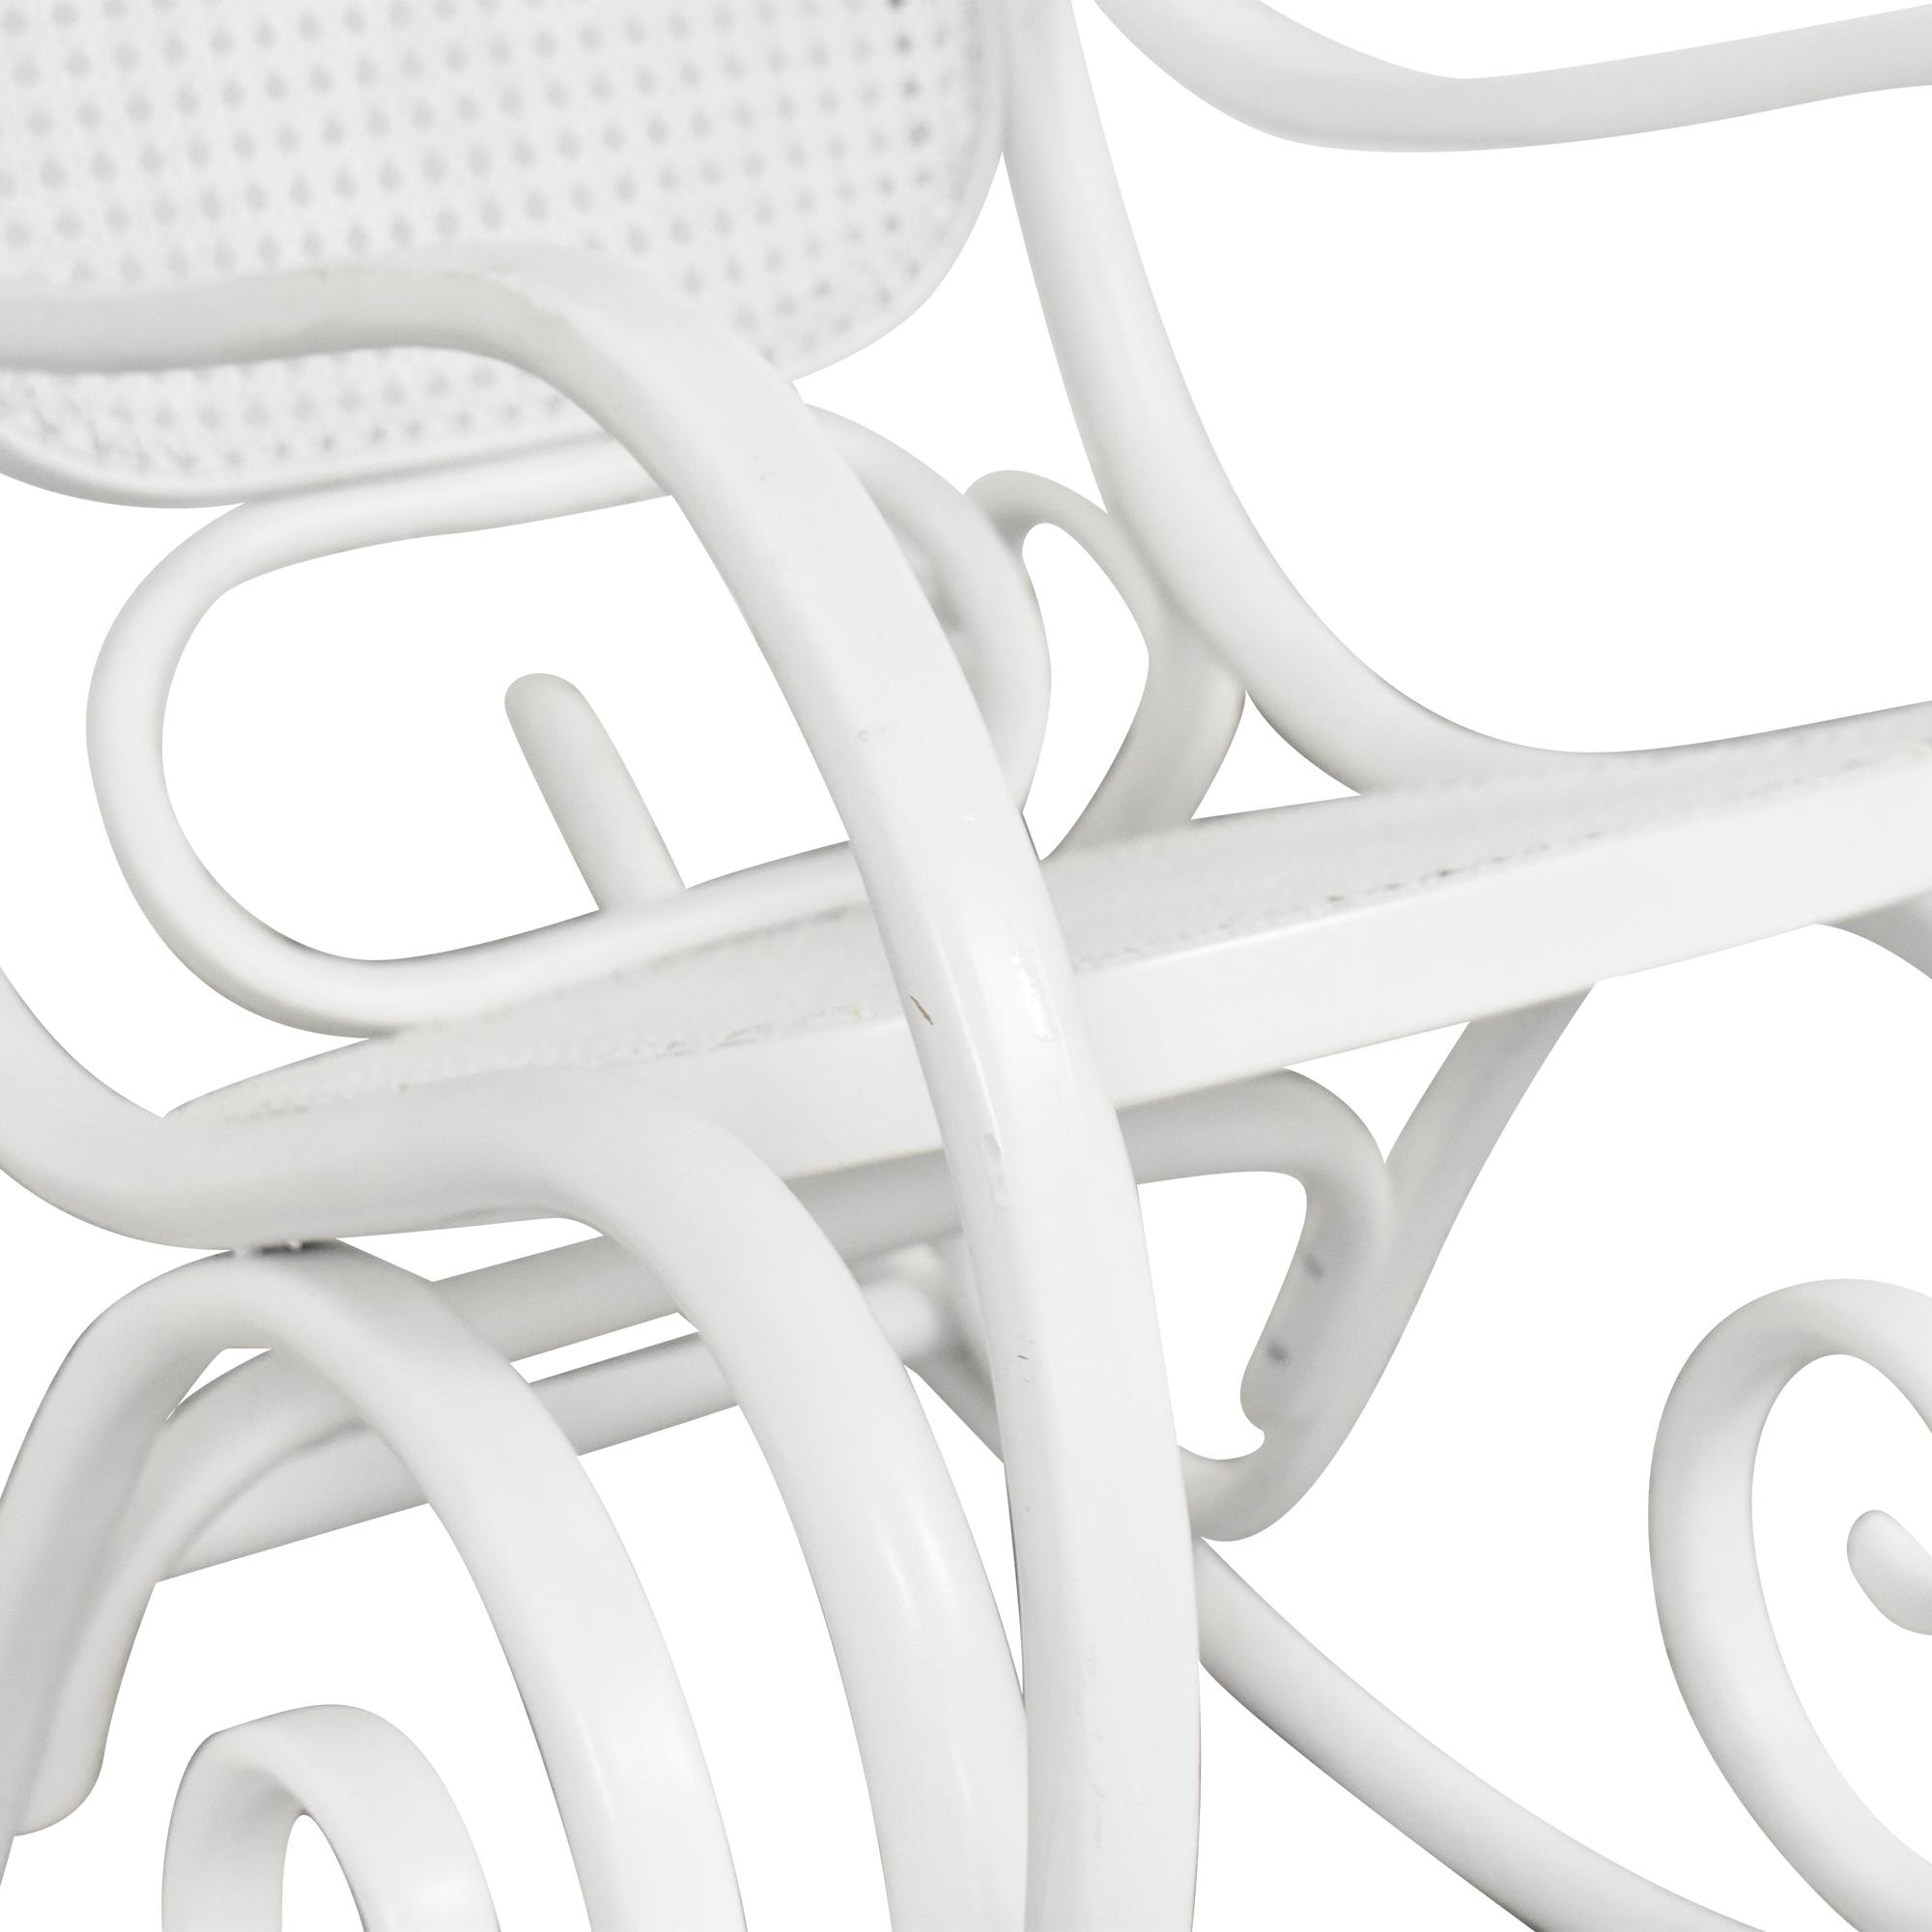 Rocking Arm Chair dimensions